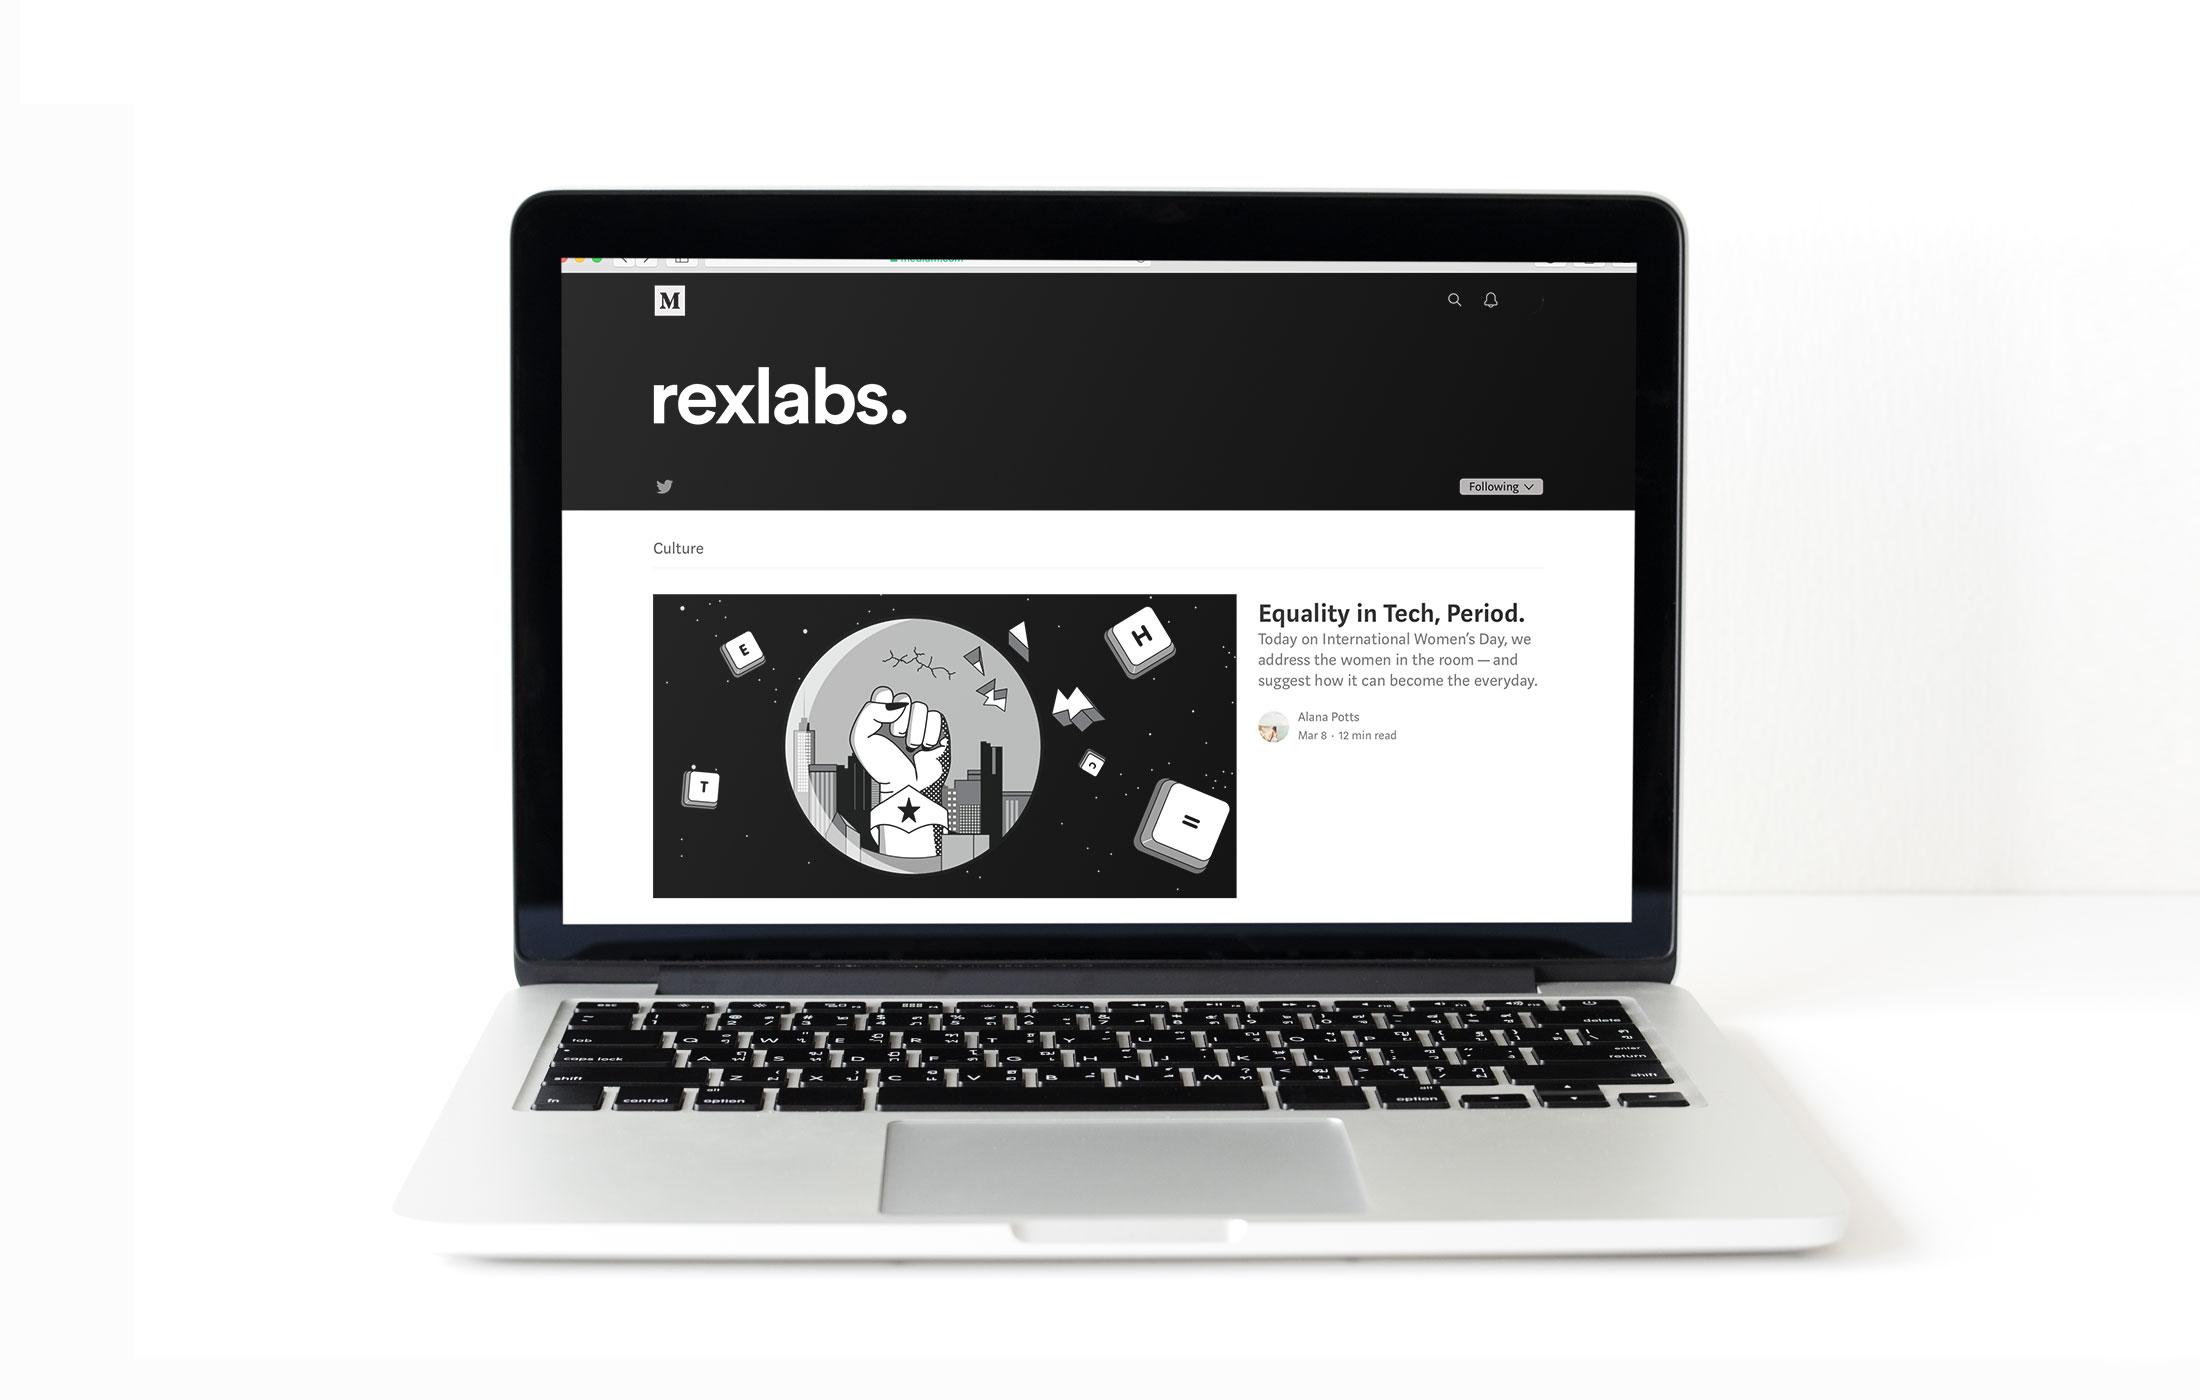 Rexlabs-women-in-tech-medium-blog-post-illustration-gif.jpg